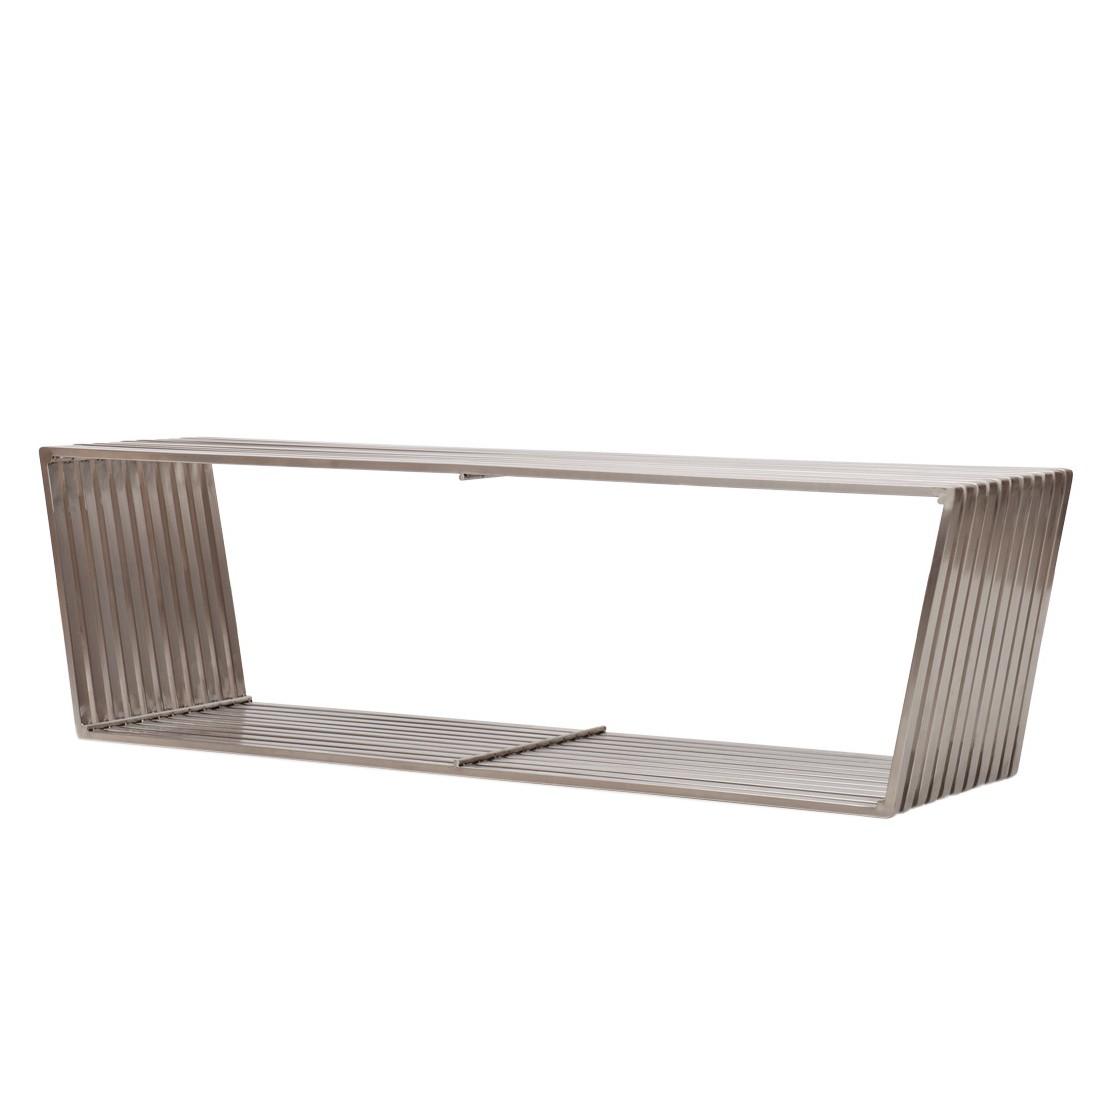 couchtisch glas h henverstellbar edelstahl ff ruestringen. Black Bedroom Furniture Sets. Home Design Ideas